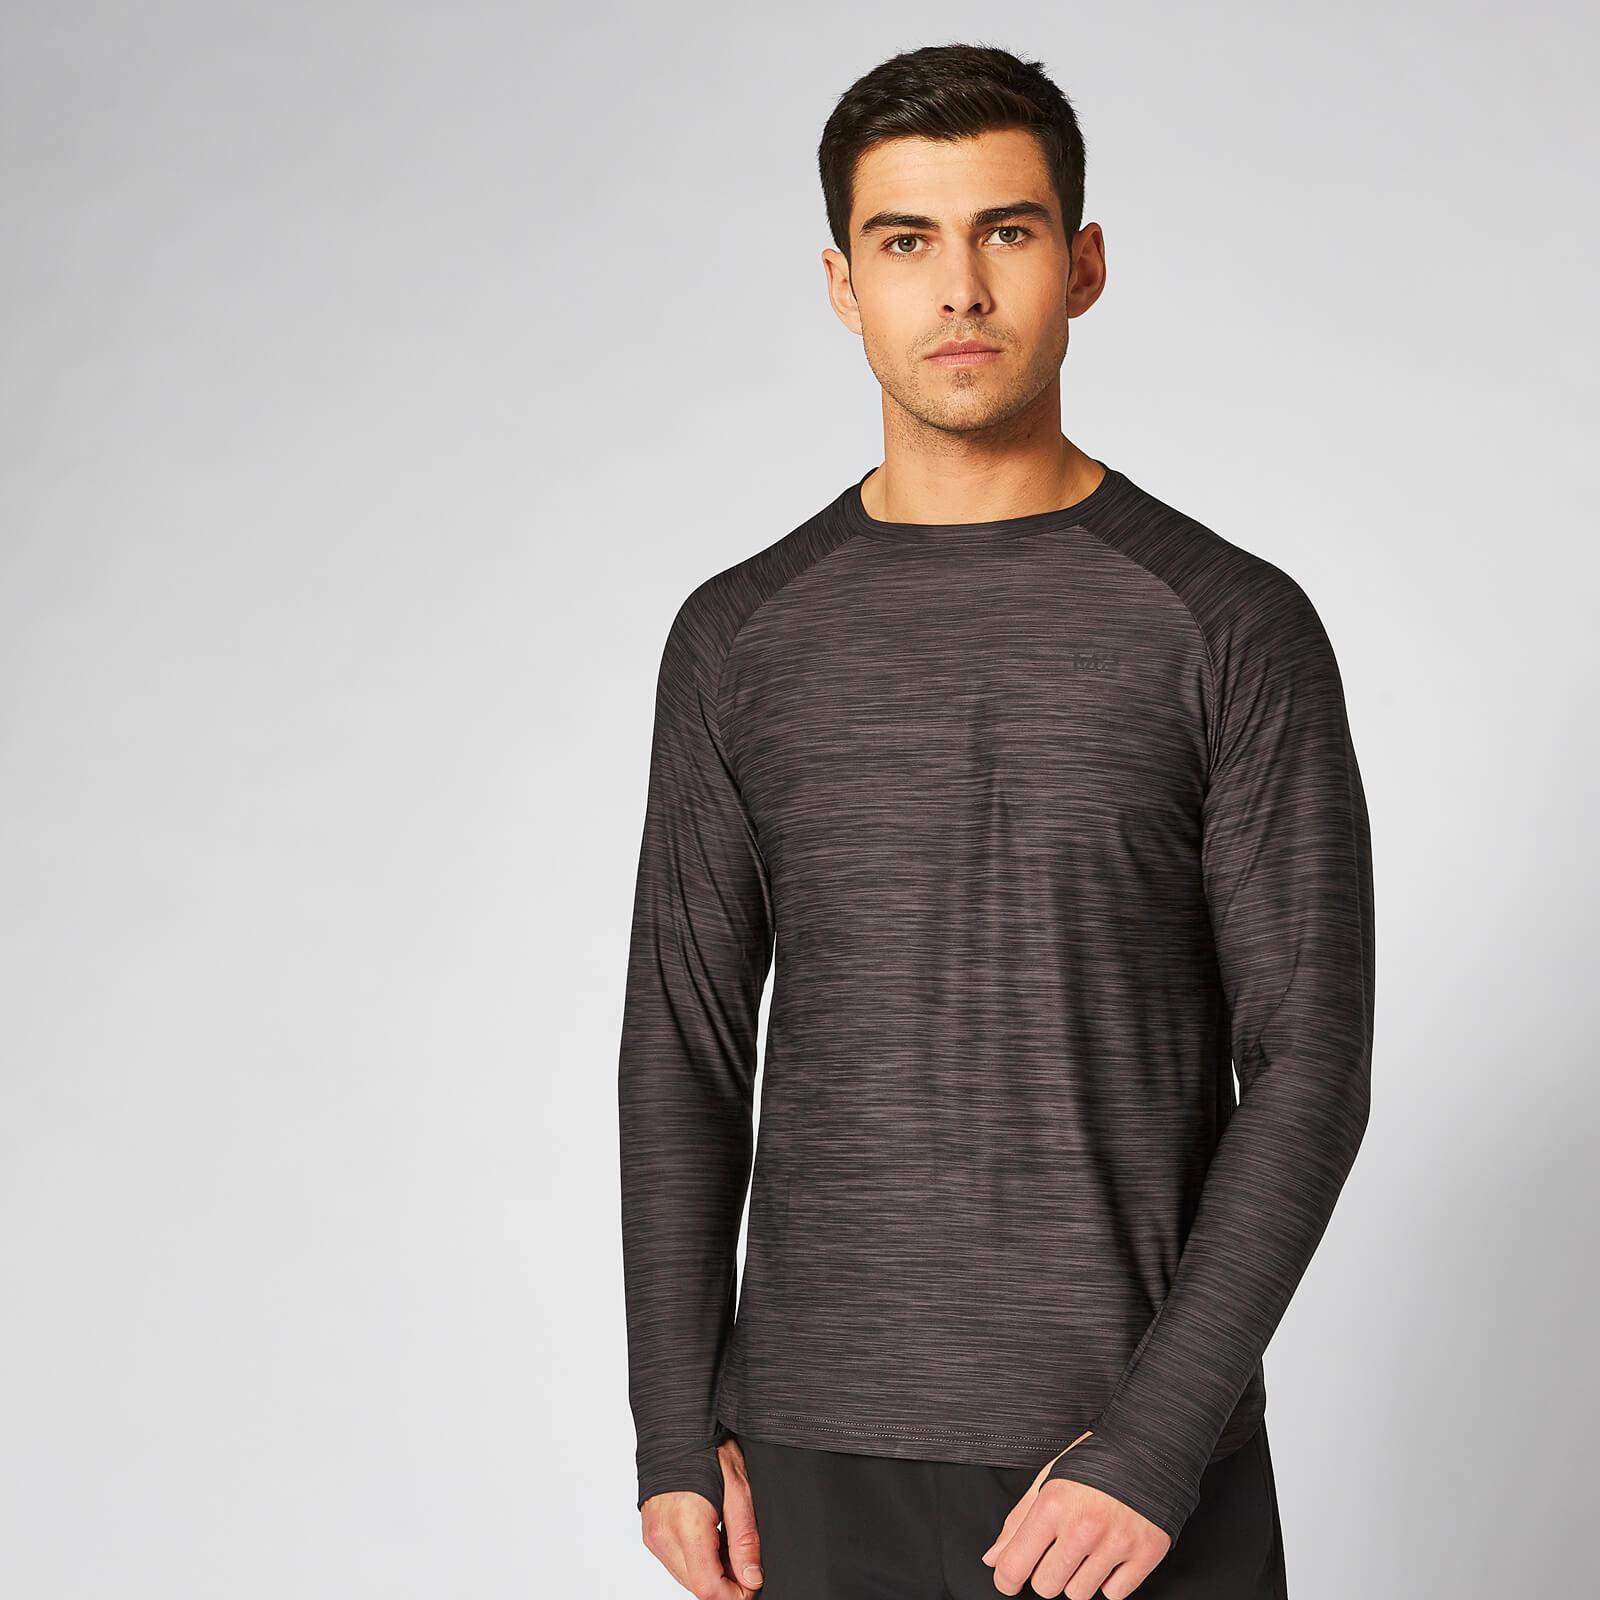 Myprotein Dry-Tech Infinity Long-Sleeve T-Shirt - Slate Marl - M